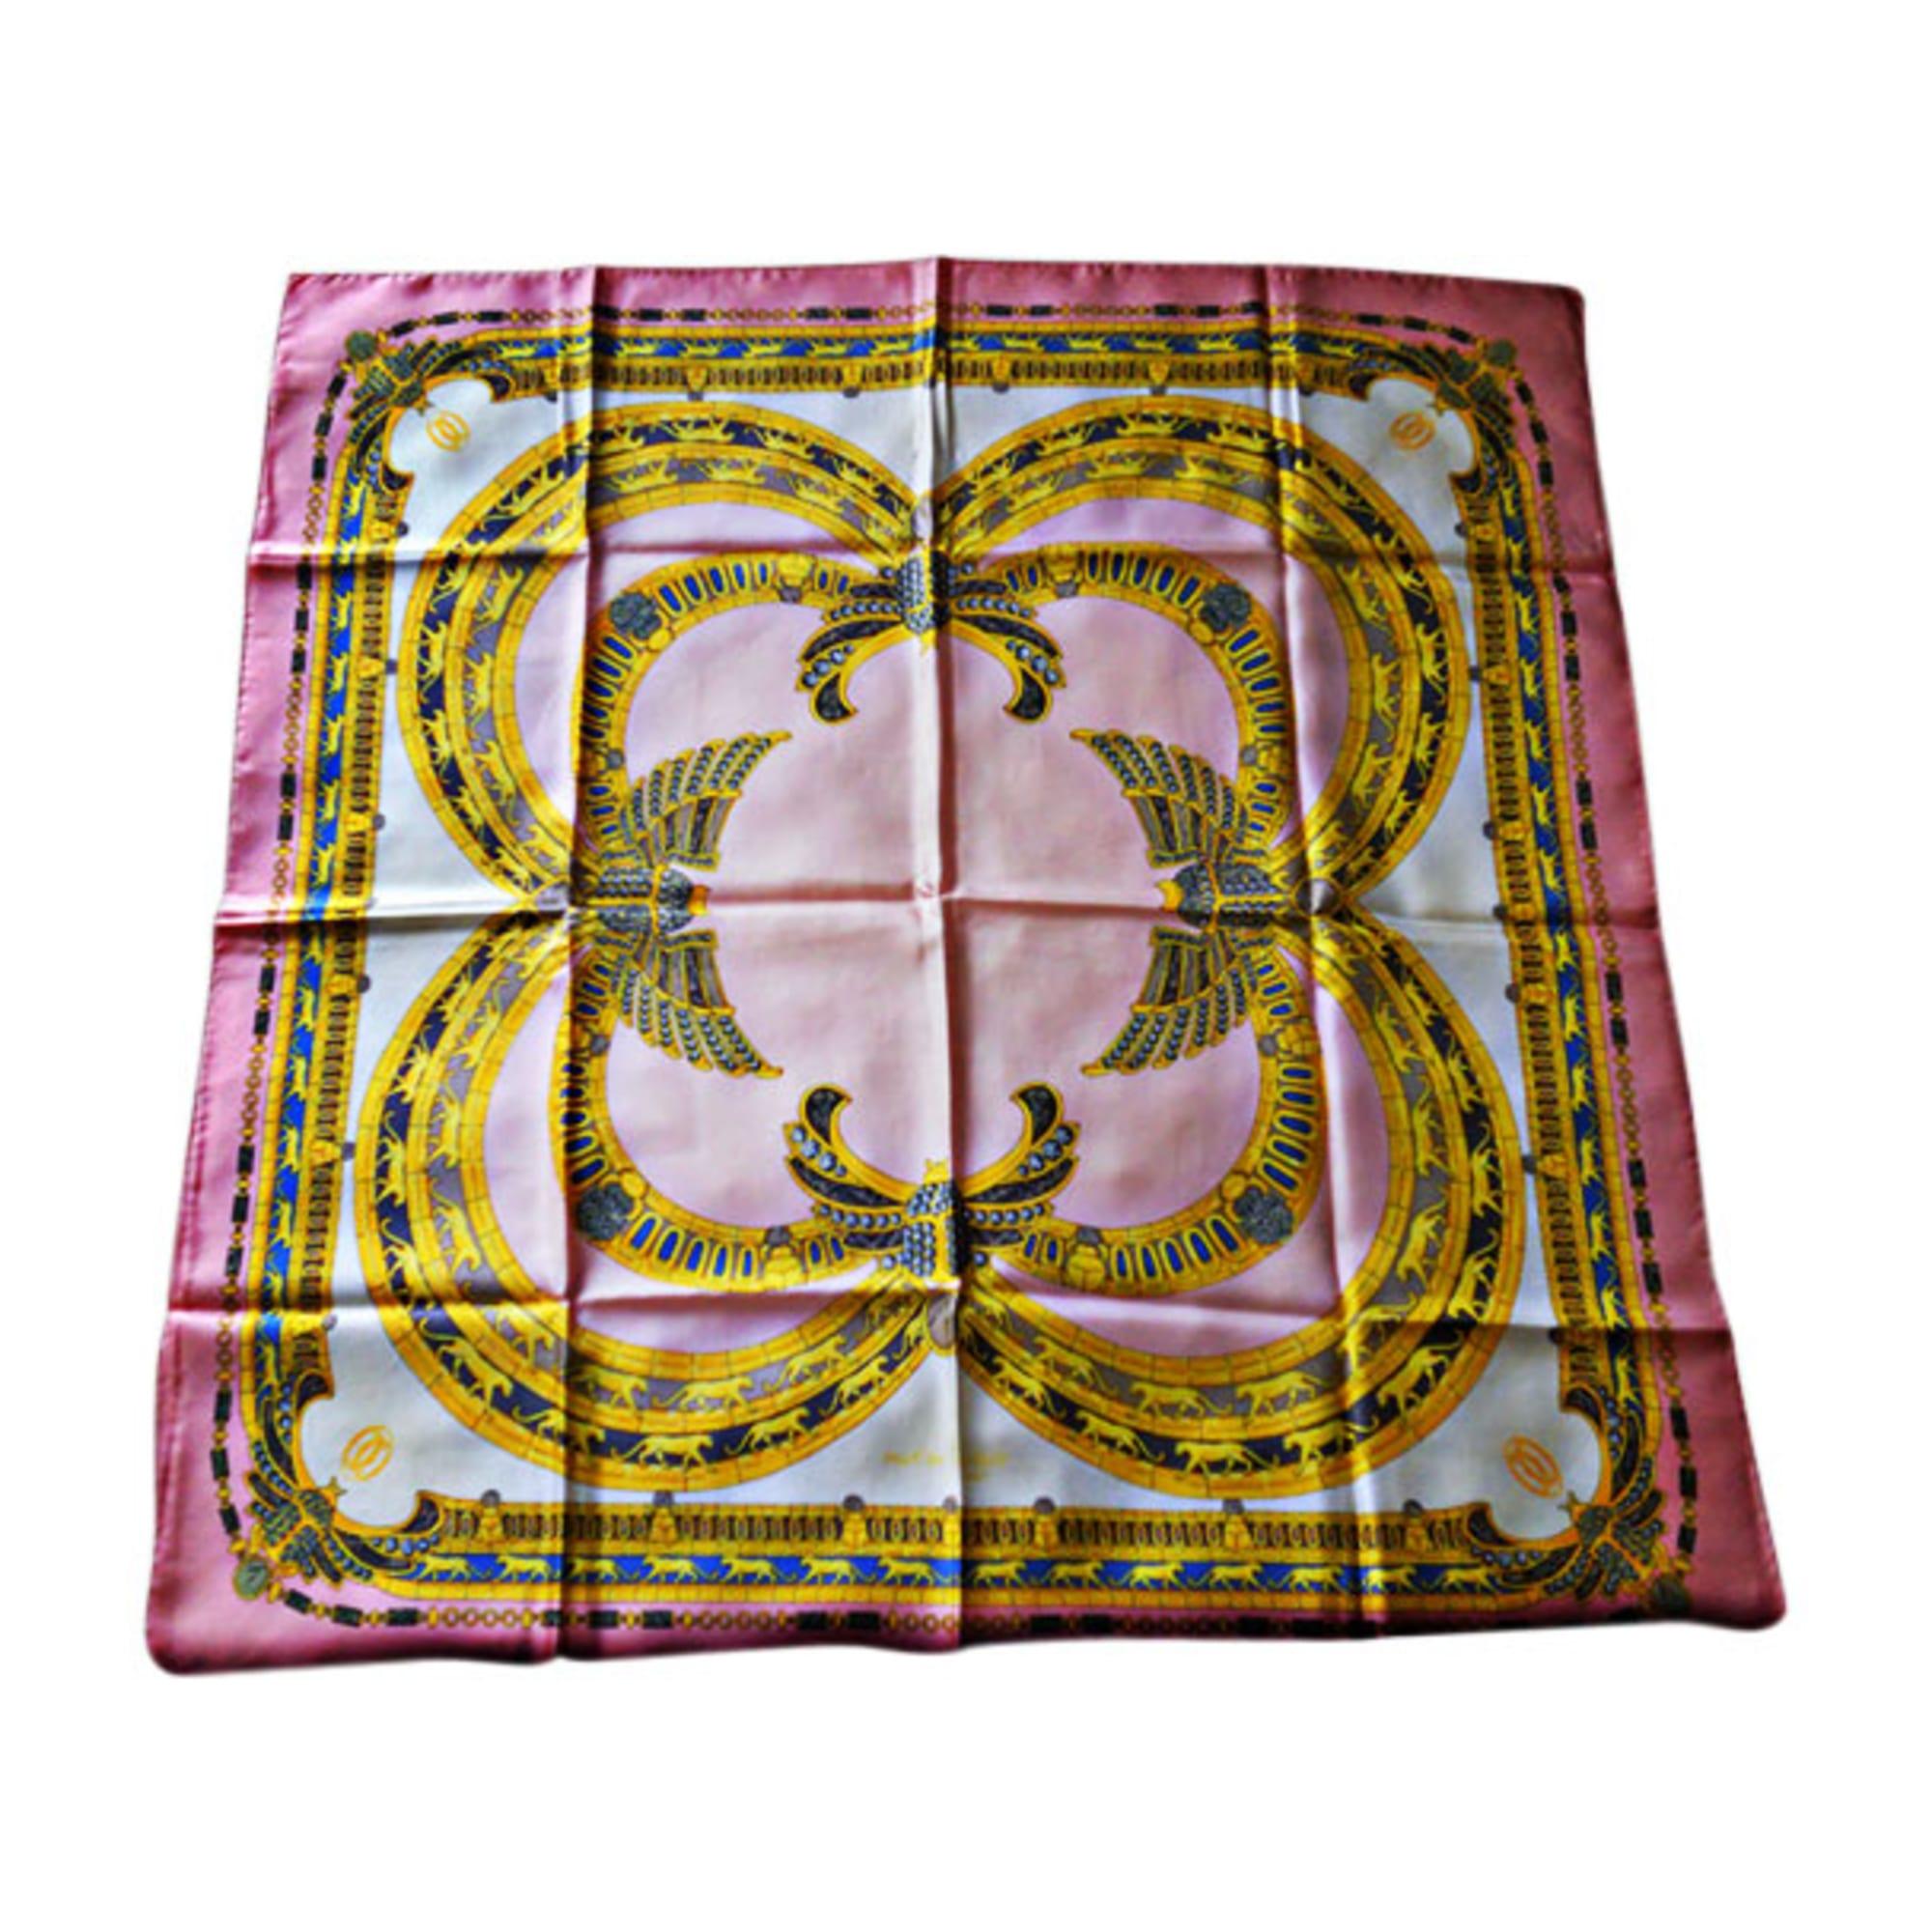 Foulard CARTIER rose vendu par Fanny 5996643 - 428576 efbbe70ff13